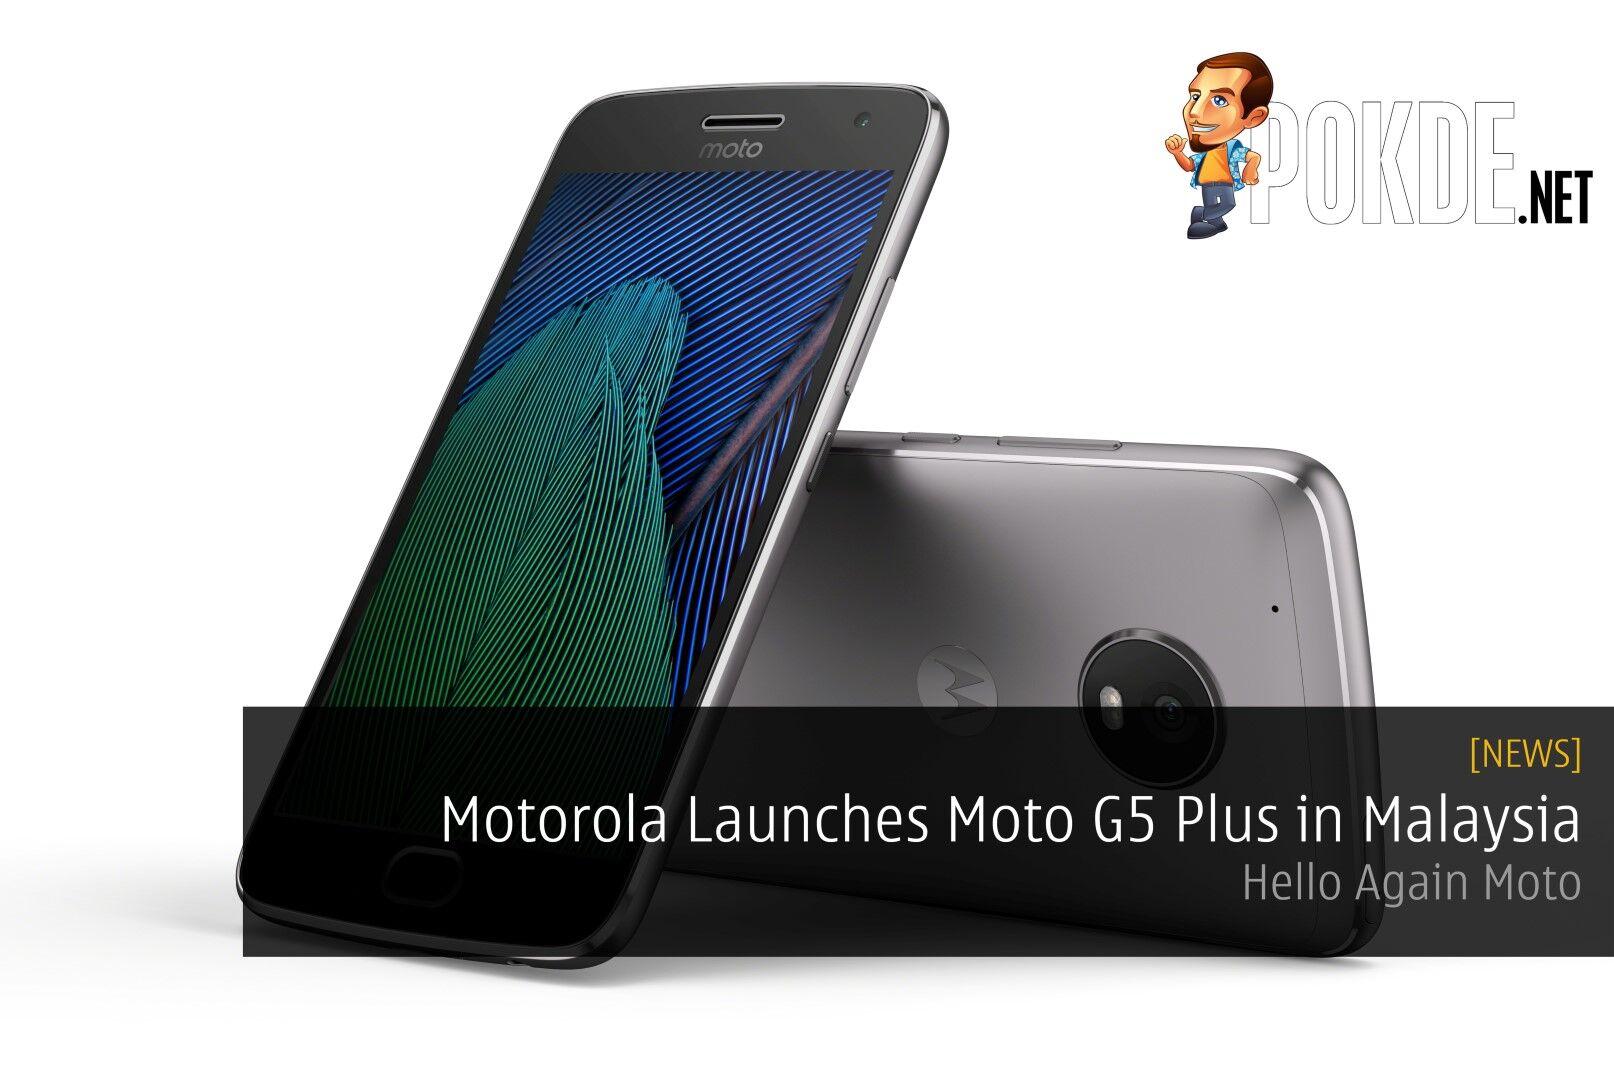 Motorola Launches Moto G5 Plus in Malaysia - Hello Again Moto 29